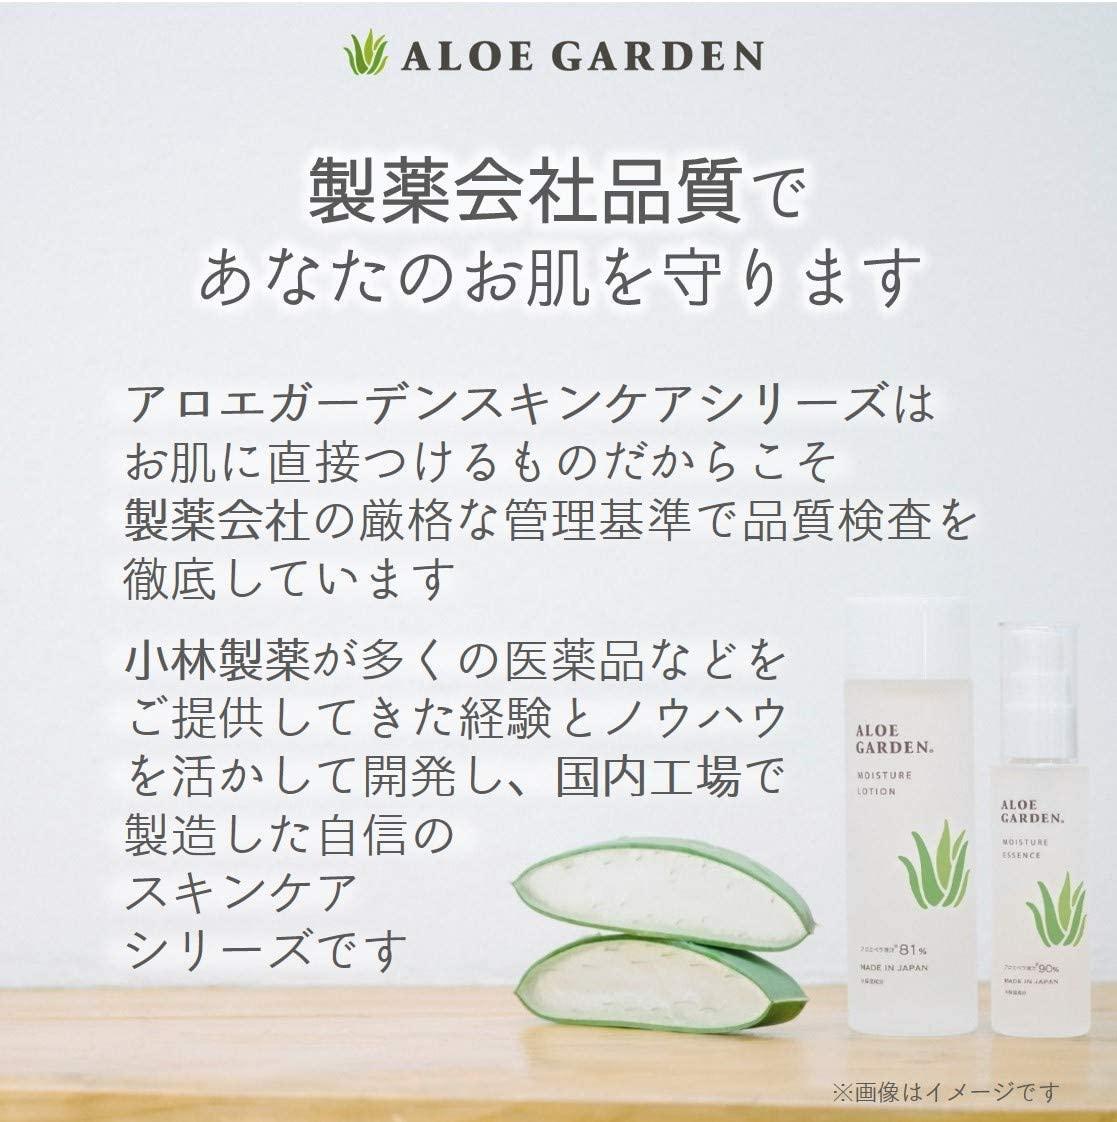 ALOE GARDEN(アロエガーデン) 高保湿化粧水の商品画像9